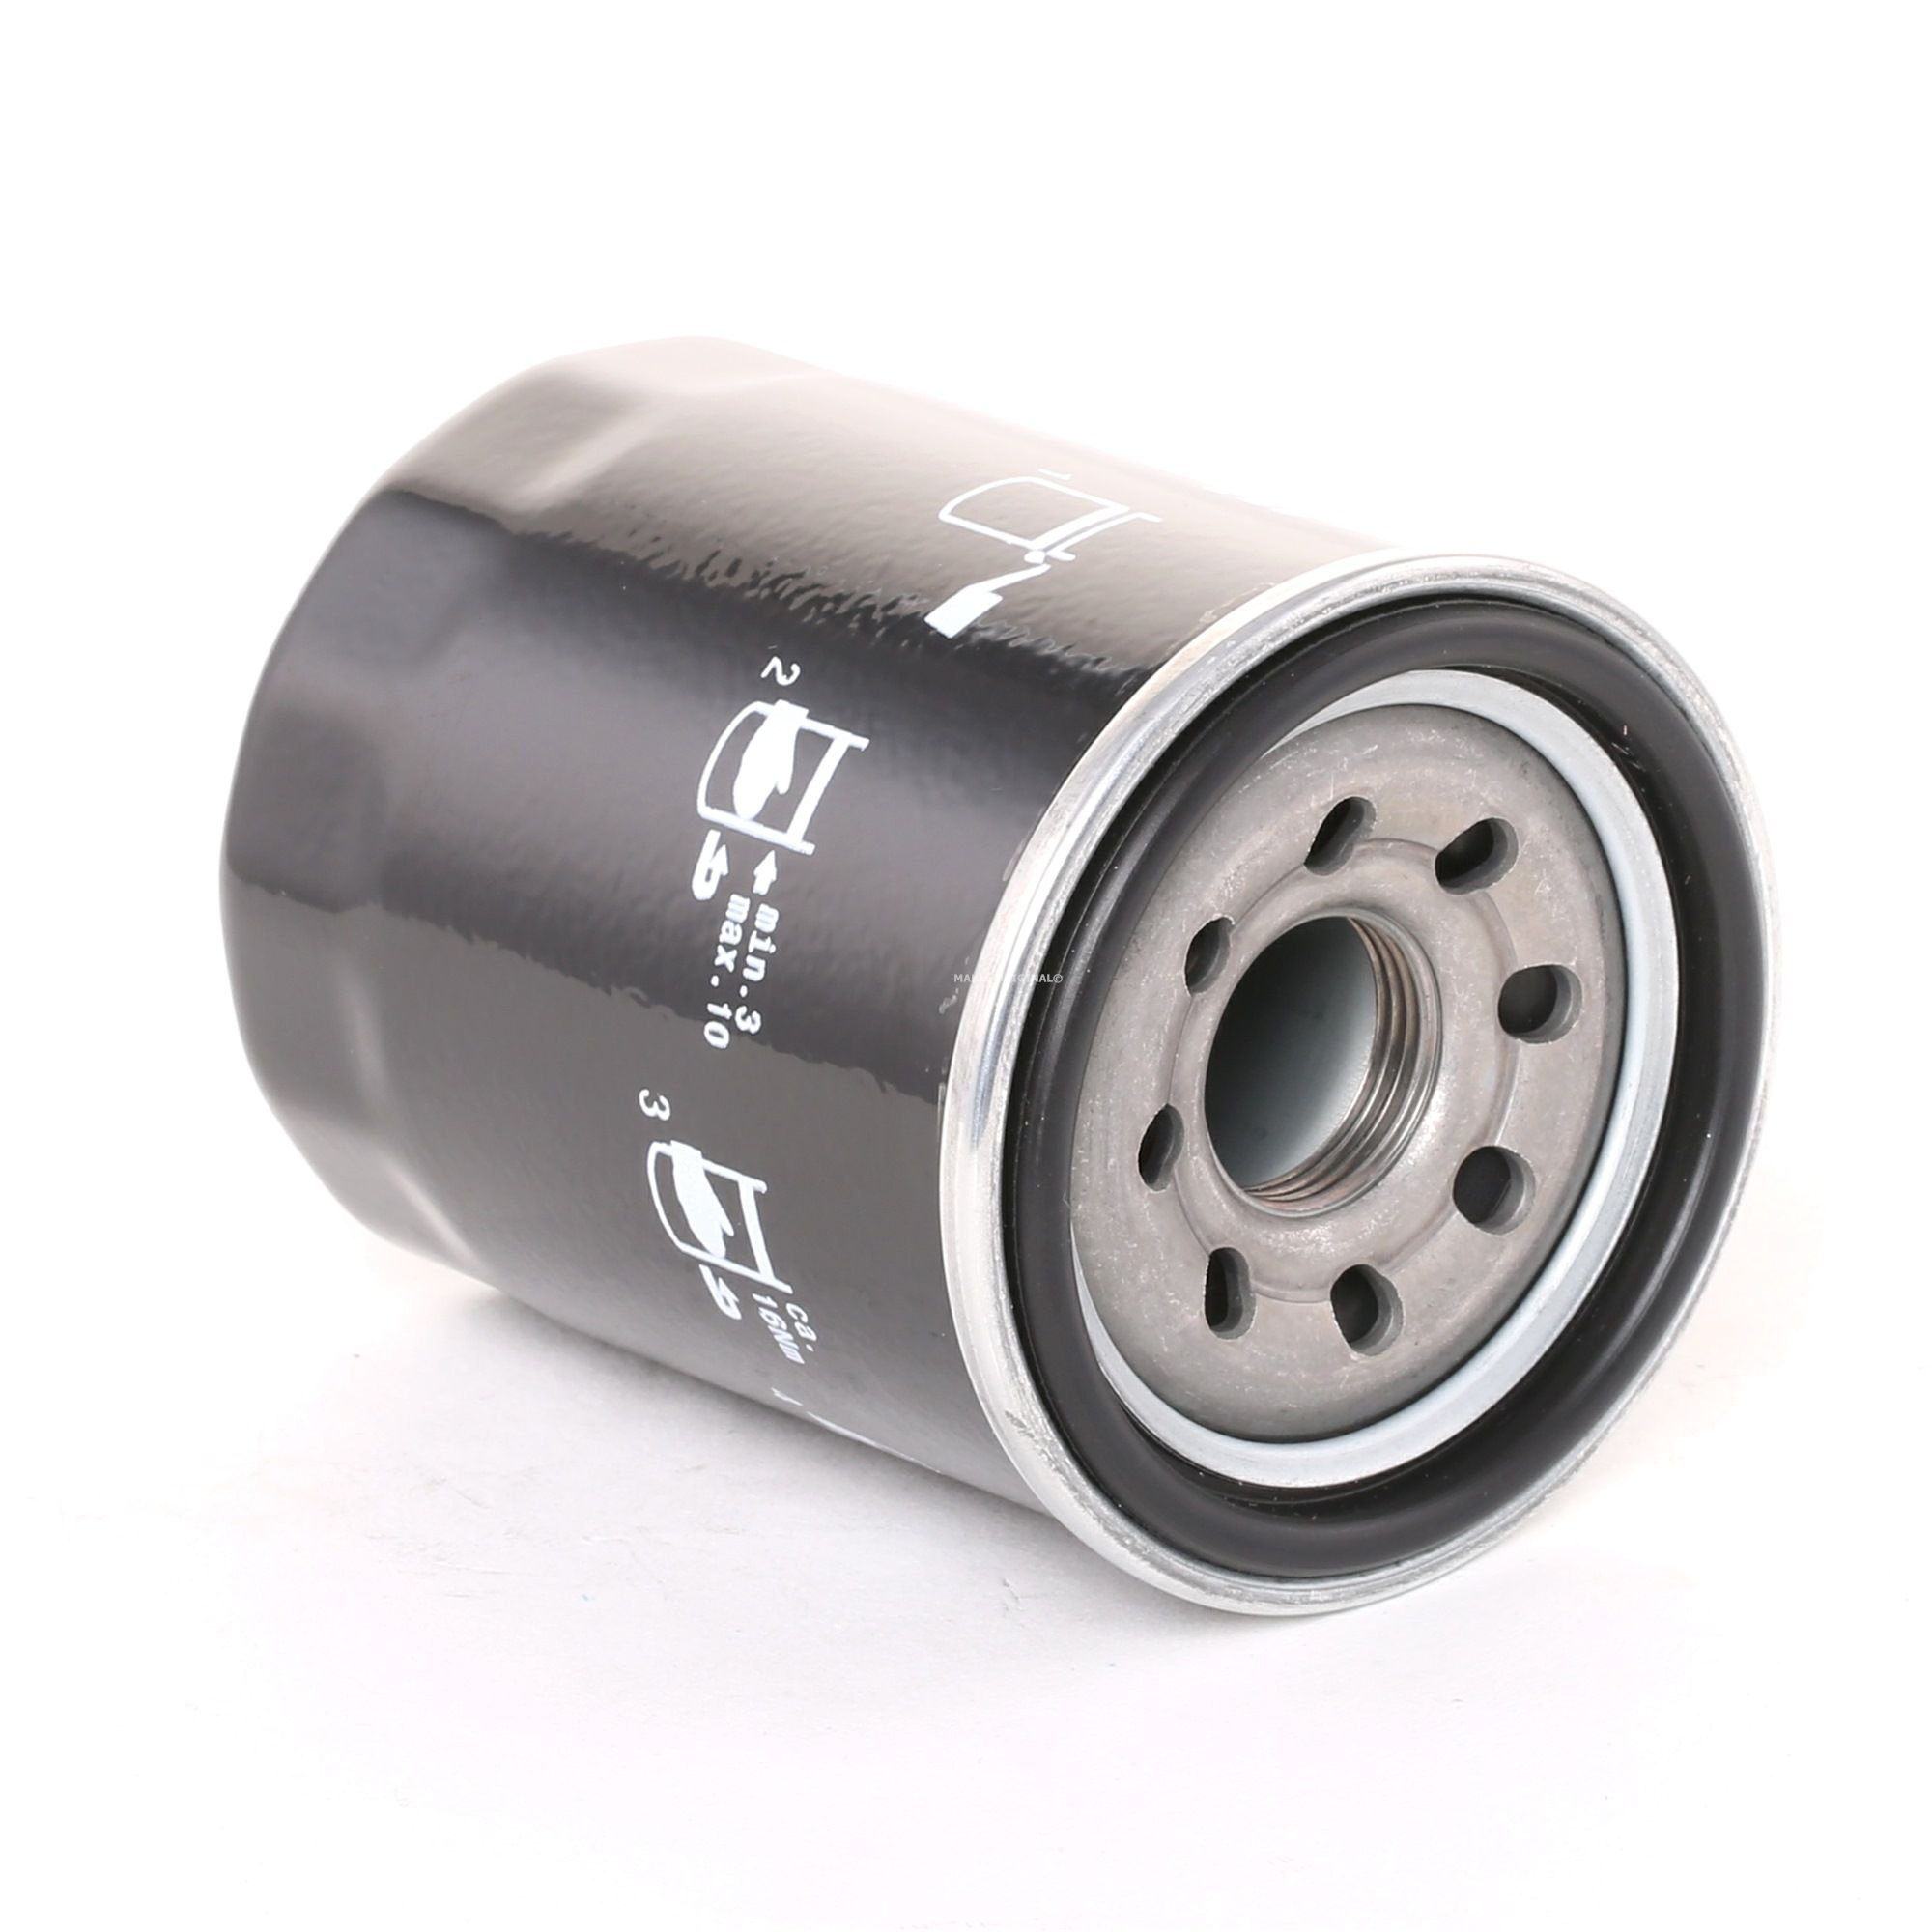 76886907 MAHLE ORIGINAL Screw-on Filter Ø: 65,5mm, Ø: 65,5mm, Height: 87mm Oil Filter OC 495 cheap